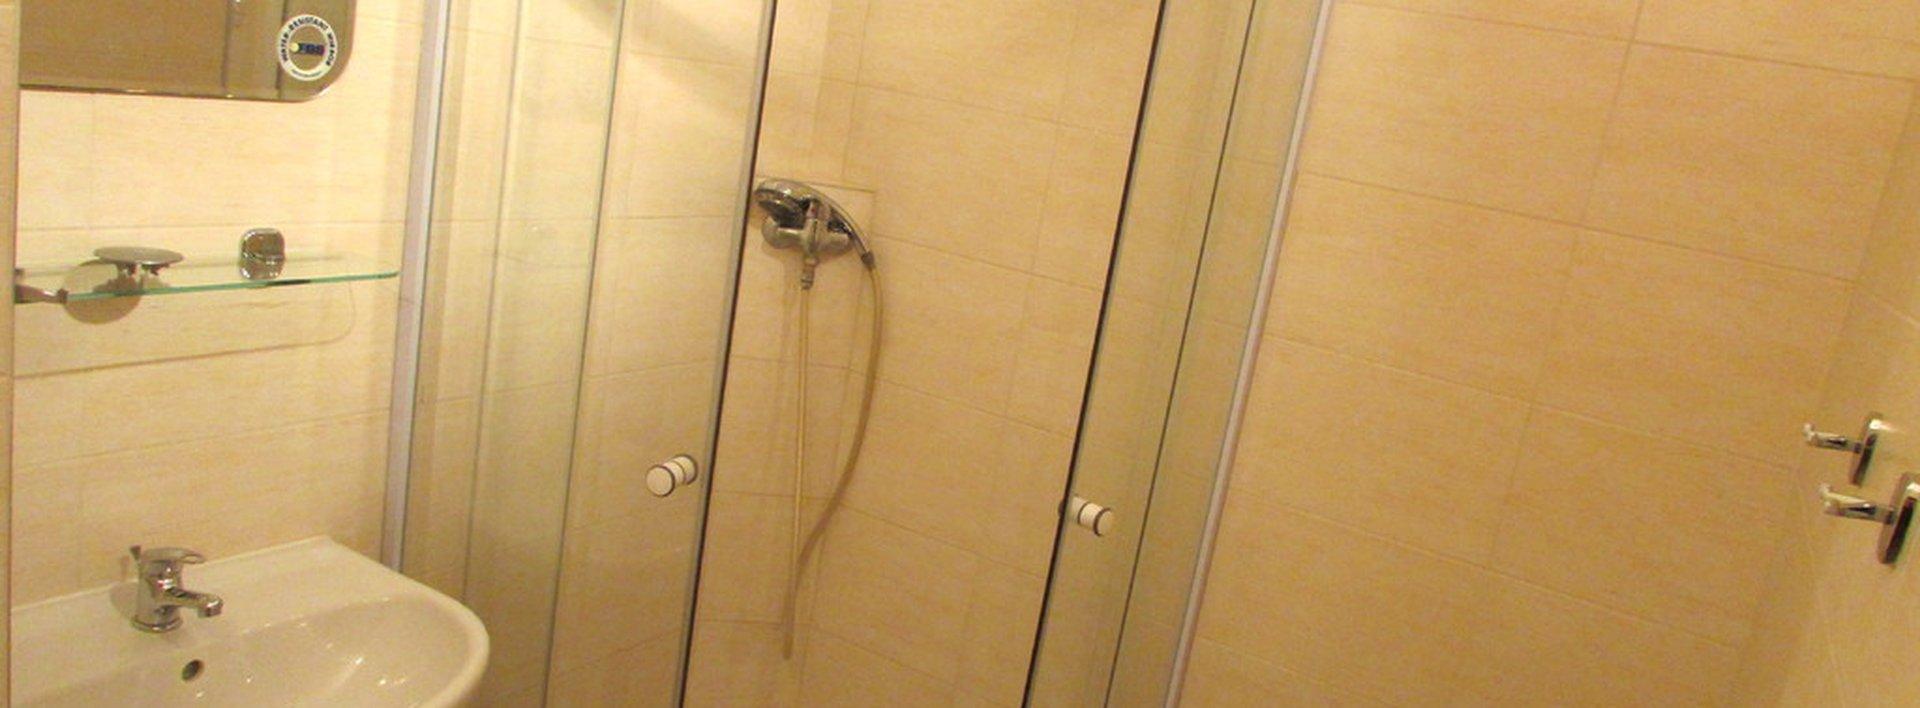 Pronájem bytu 2+1, 47 m² - Liberec, Ruprechtice, Ev.č.: N48766